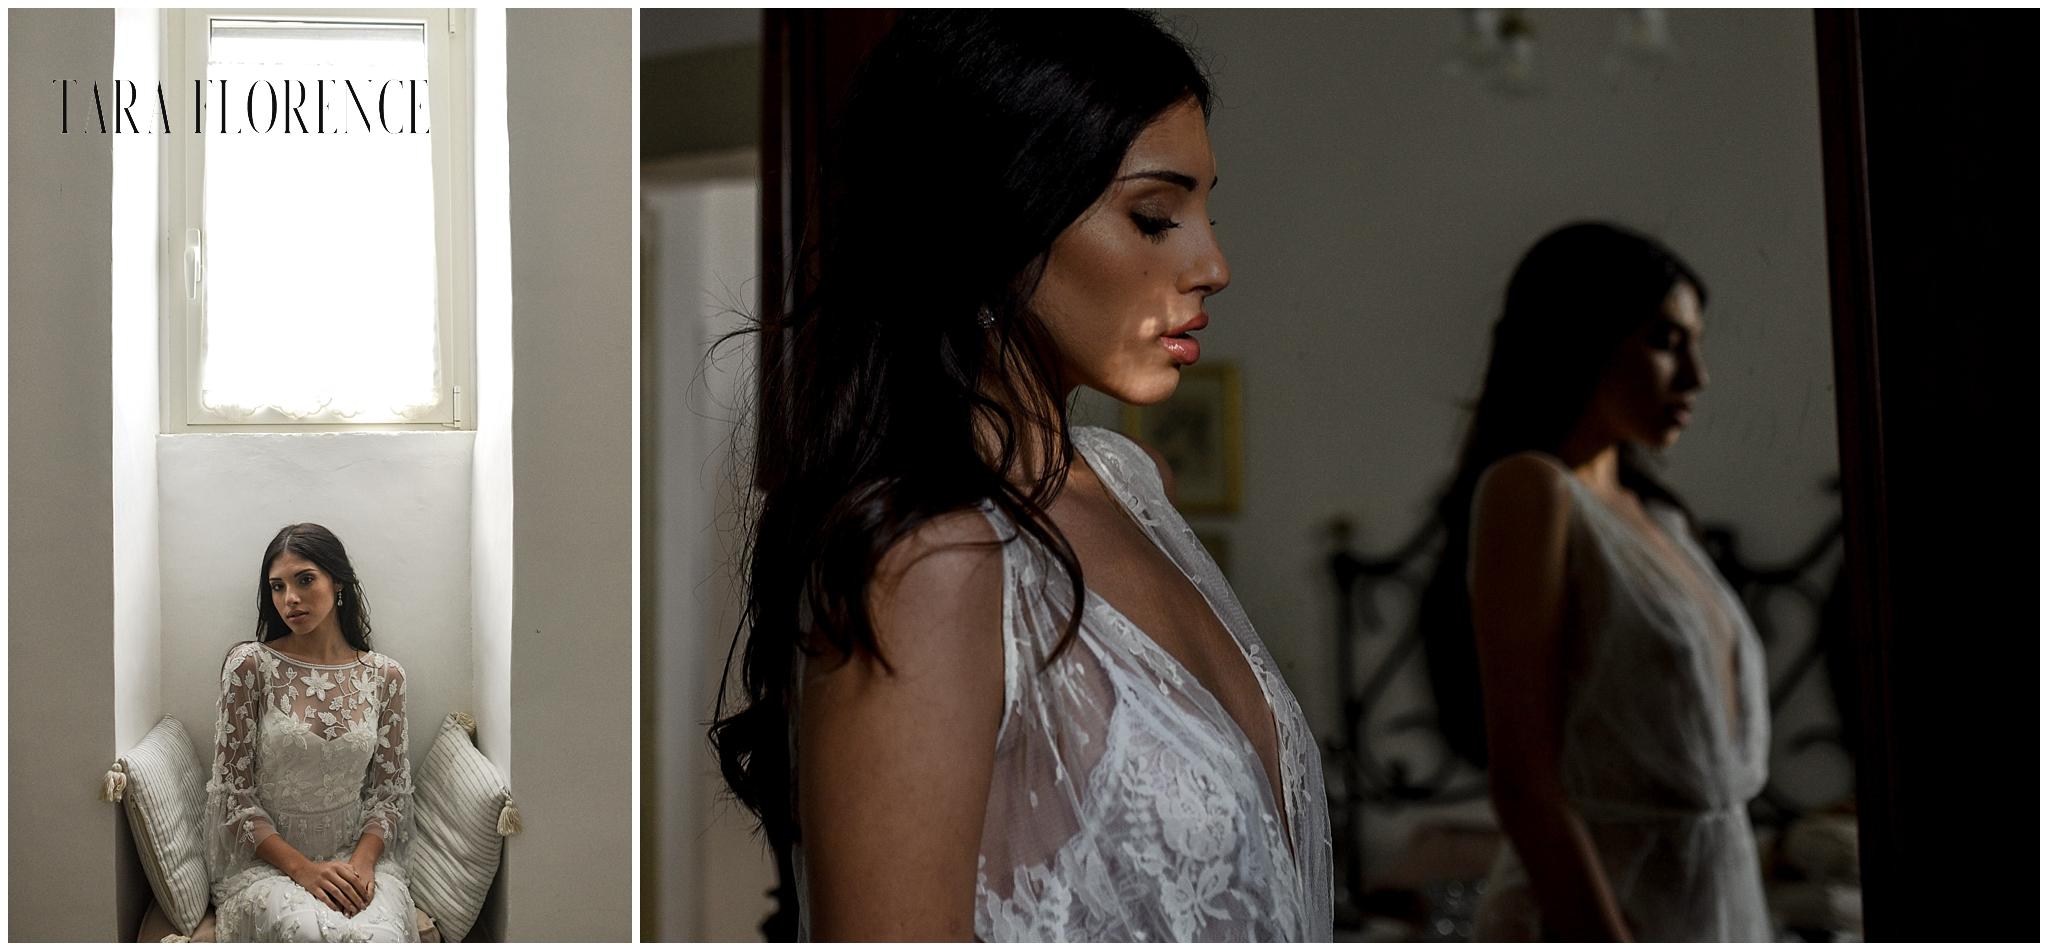 Puglia-Tara-Florence-Bridal-Editorial-151_WEB.jpg